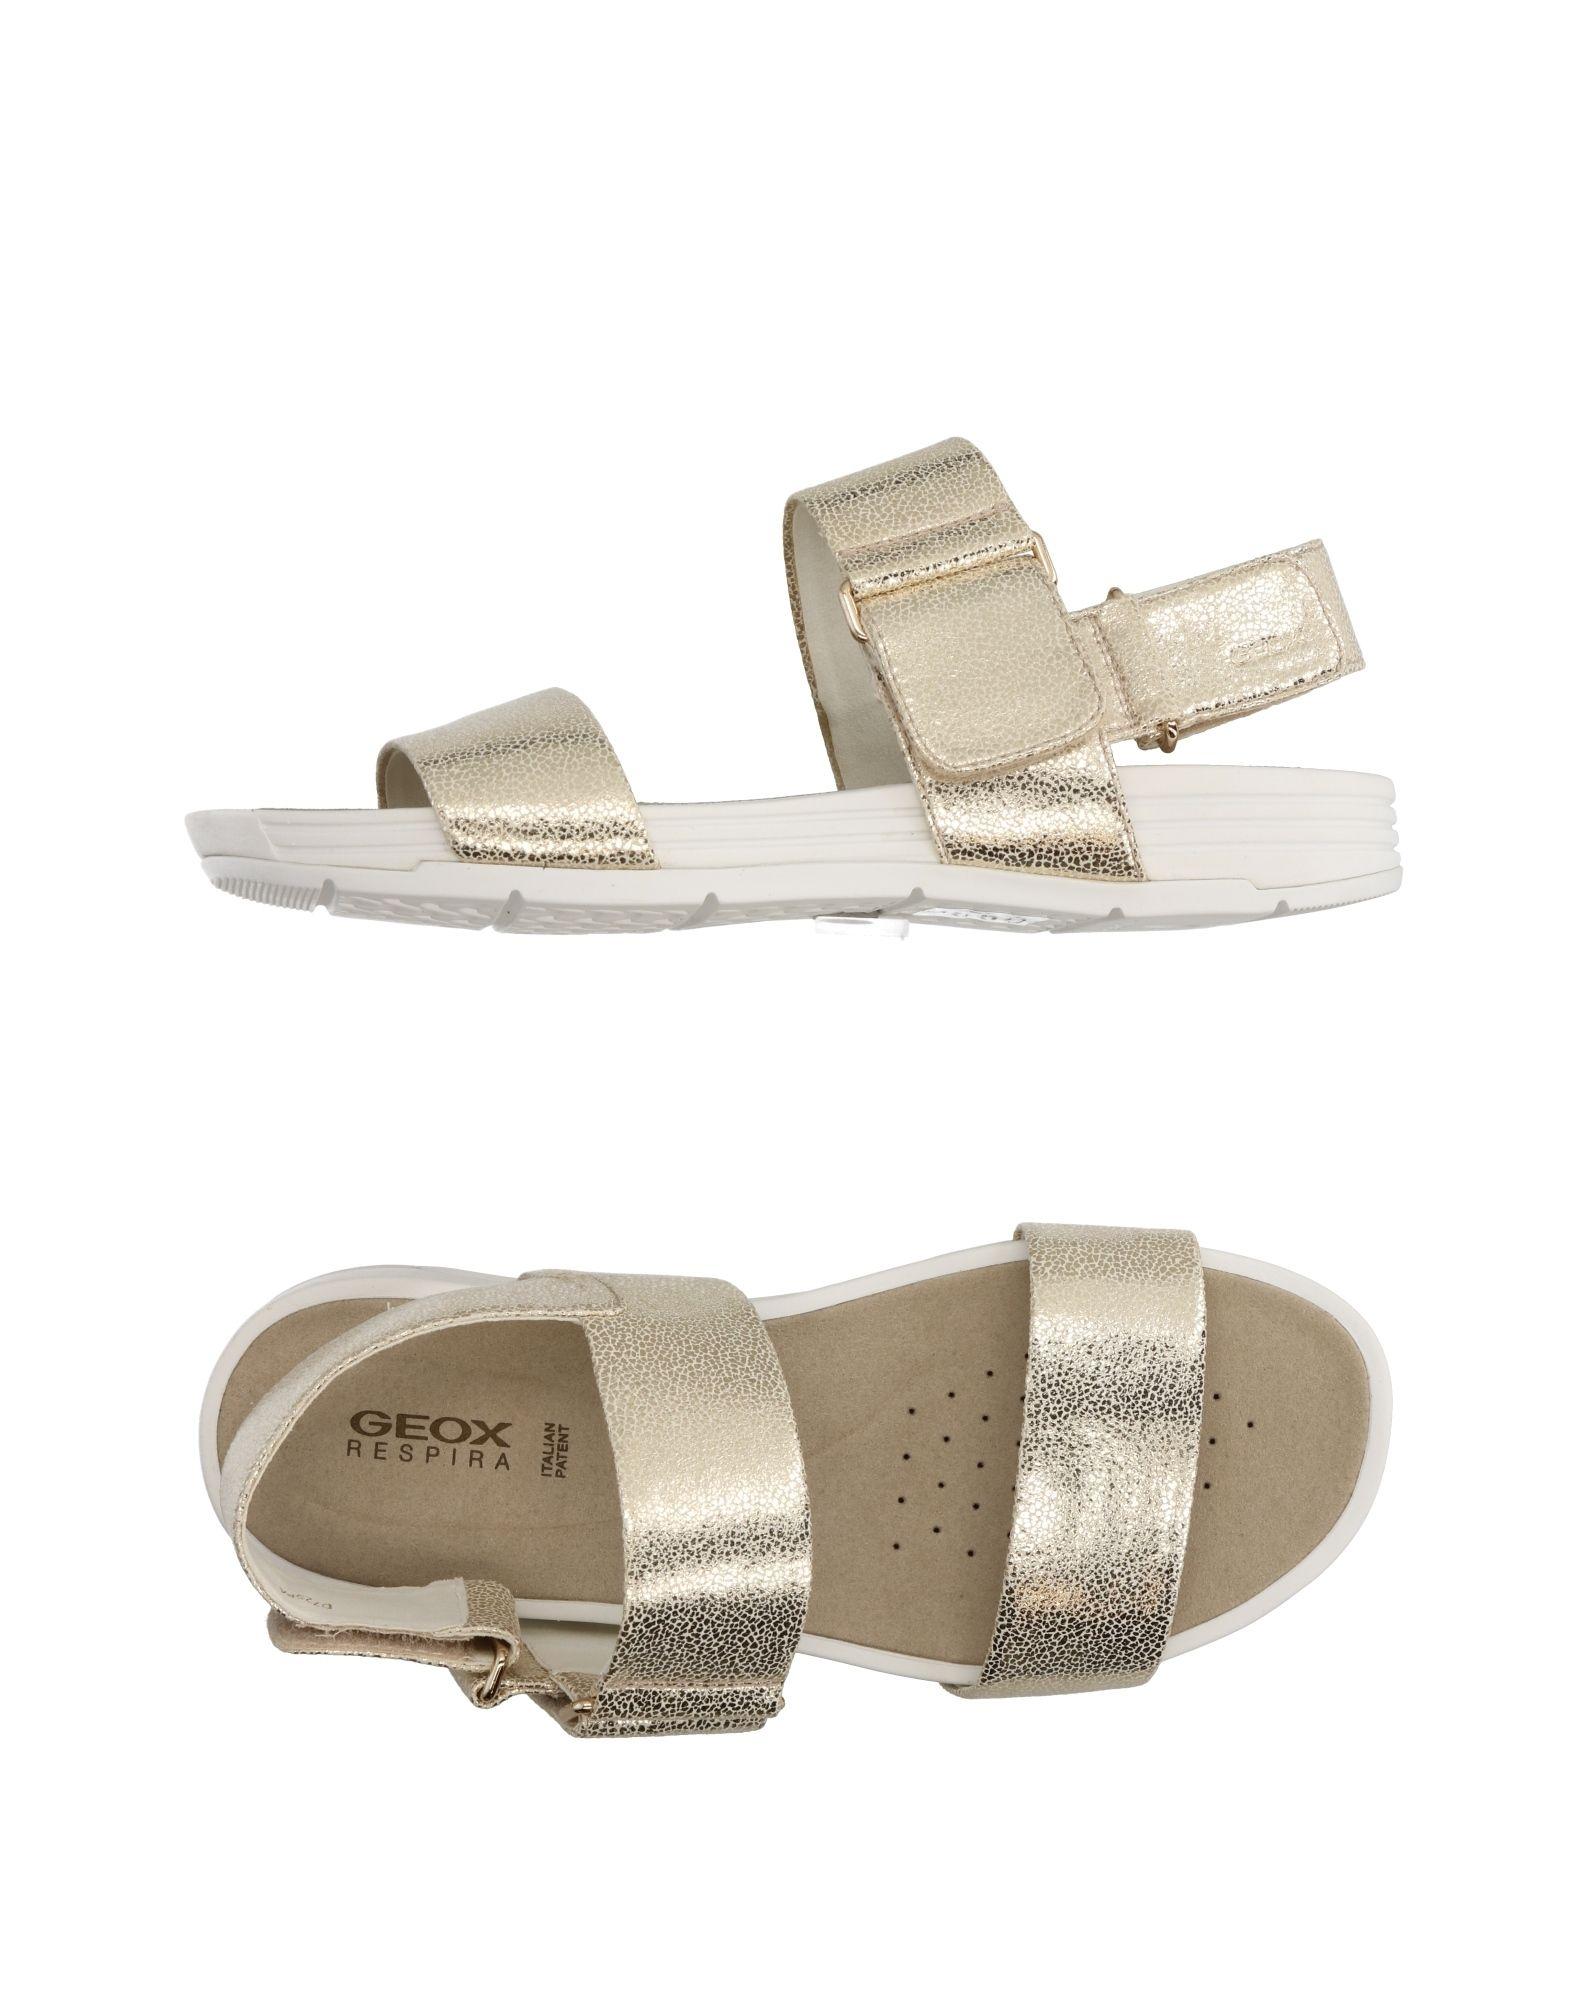 Geox Sandalen Damen  11256853EN Gute Qualität beliebte Schuhe